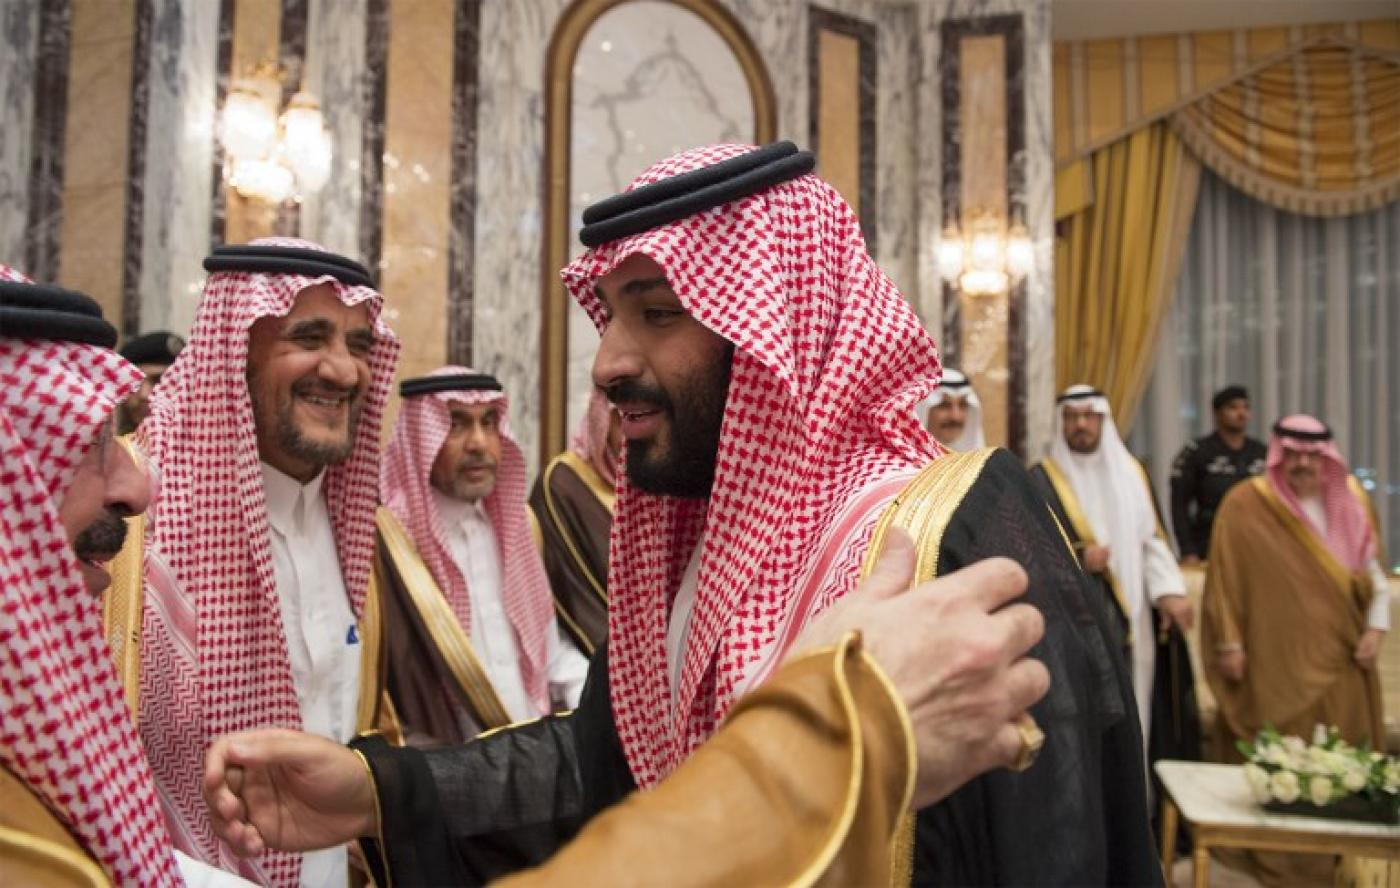 EXCLUSIVE: Senior Saudi figures tortured and beaten in purge